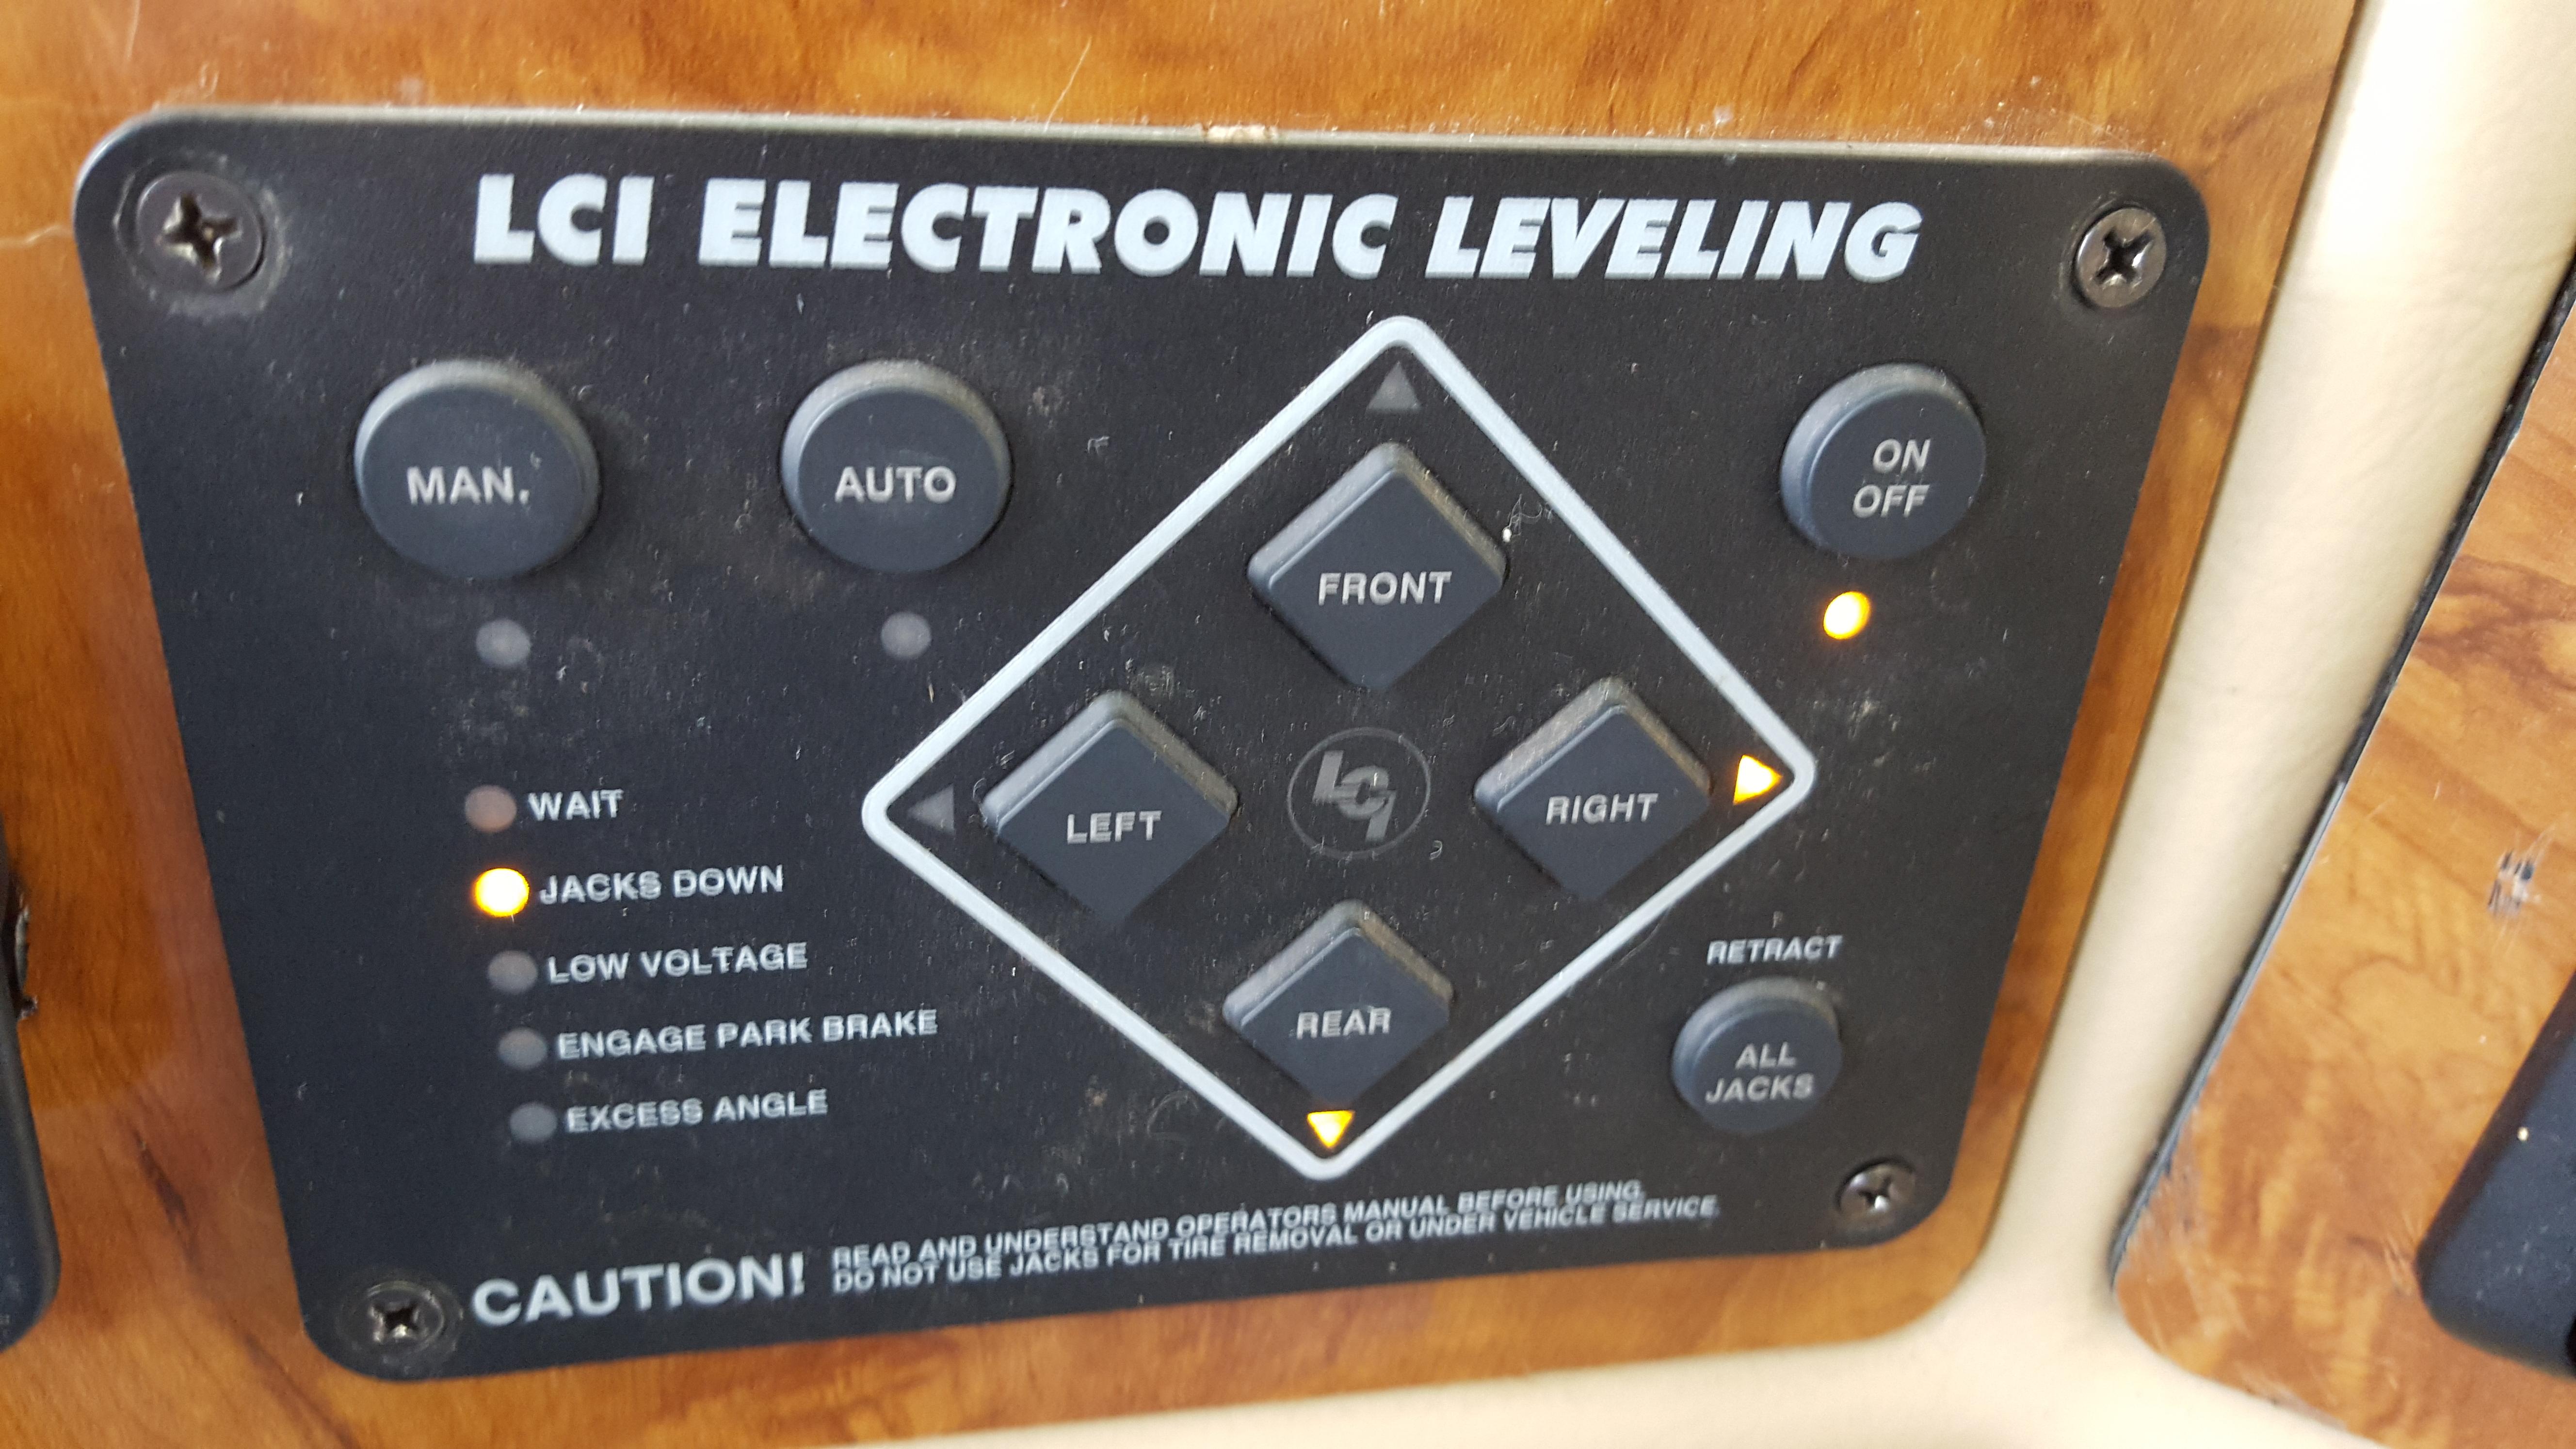 I own a 2006 Damon Daybreak model 3274  On the leveling